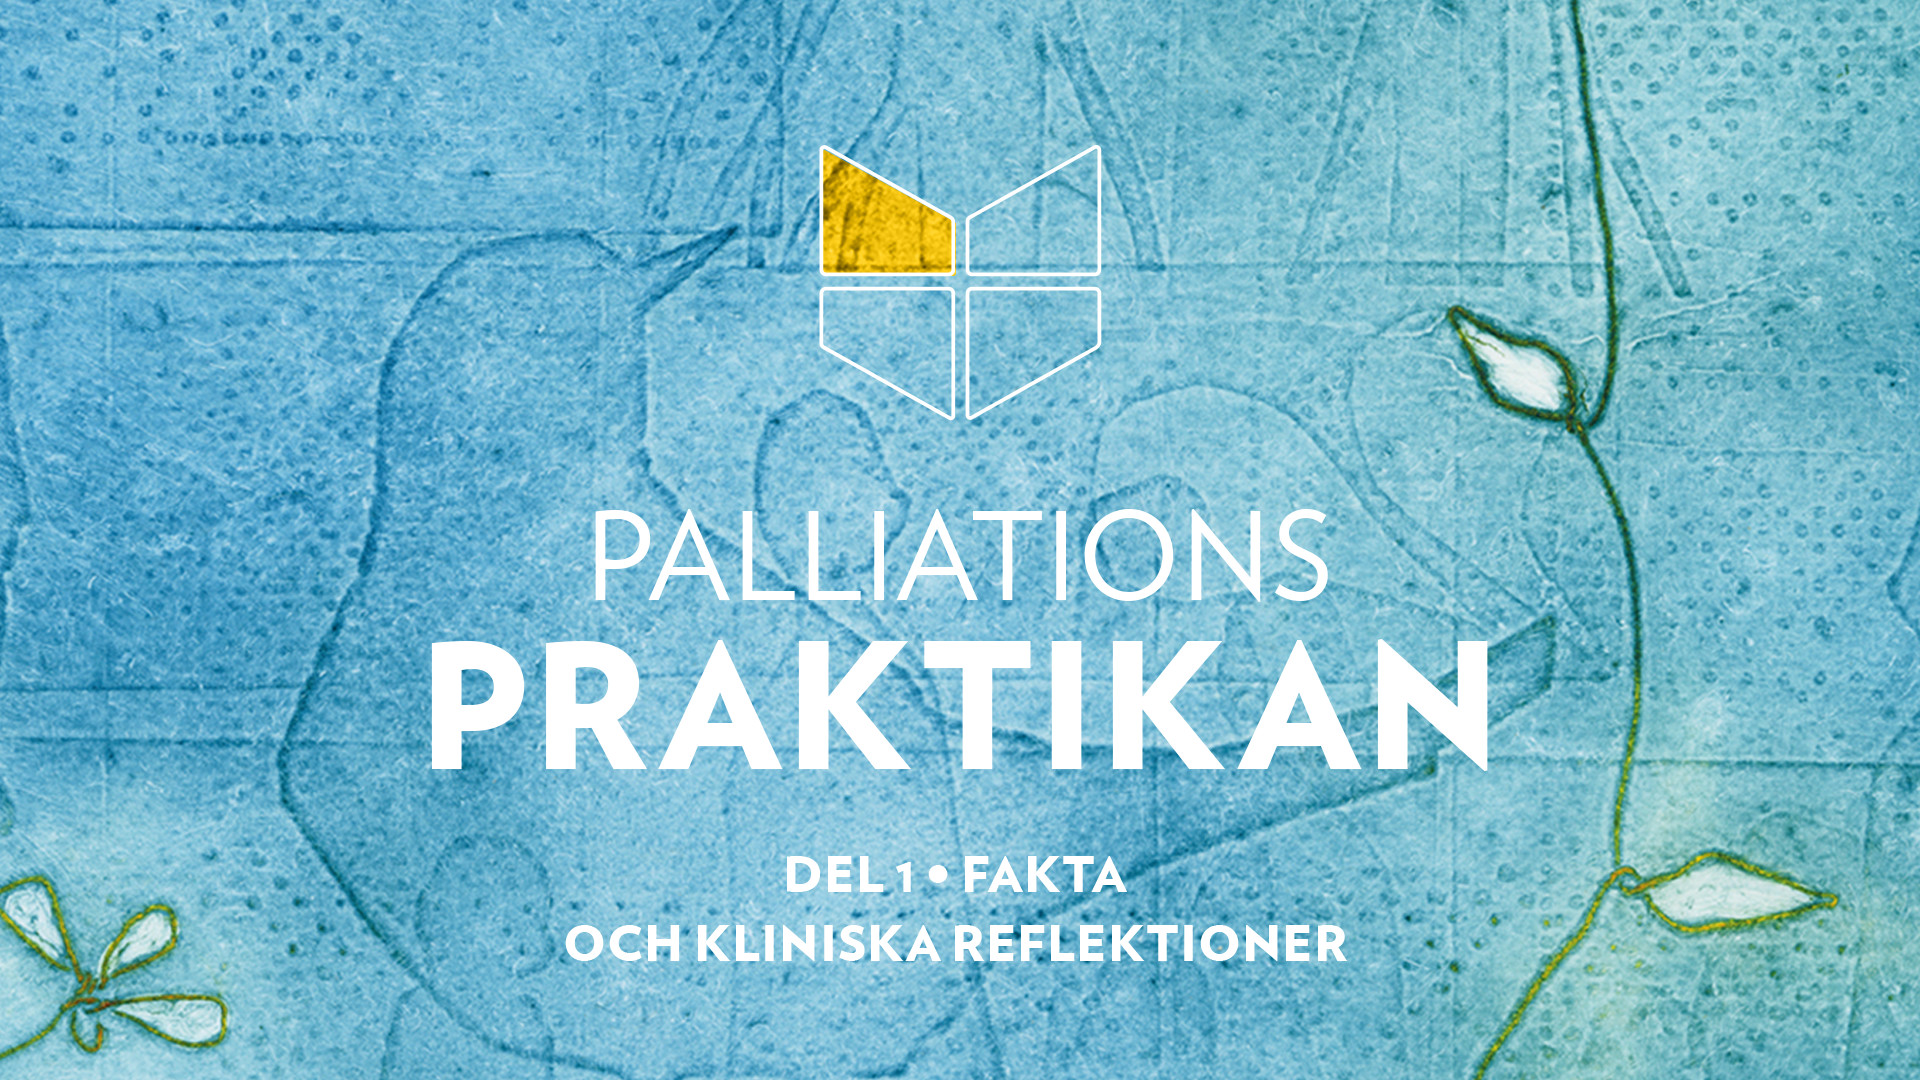 Palliationspraktikan del 1 - Kapitel 8: Vårdmiljö